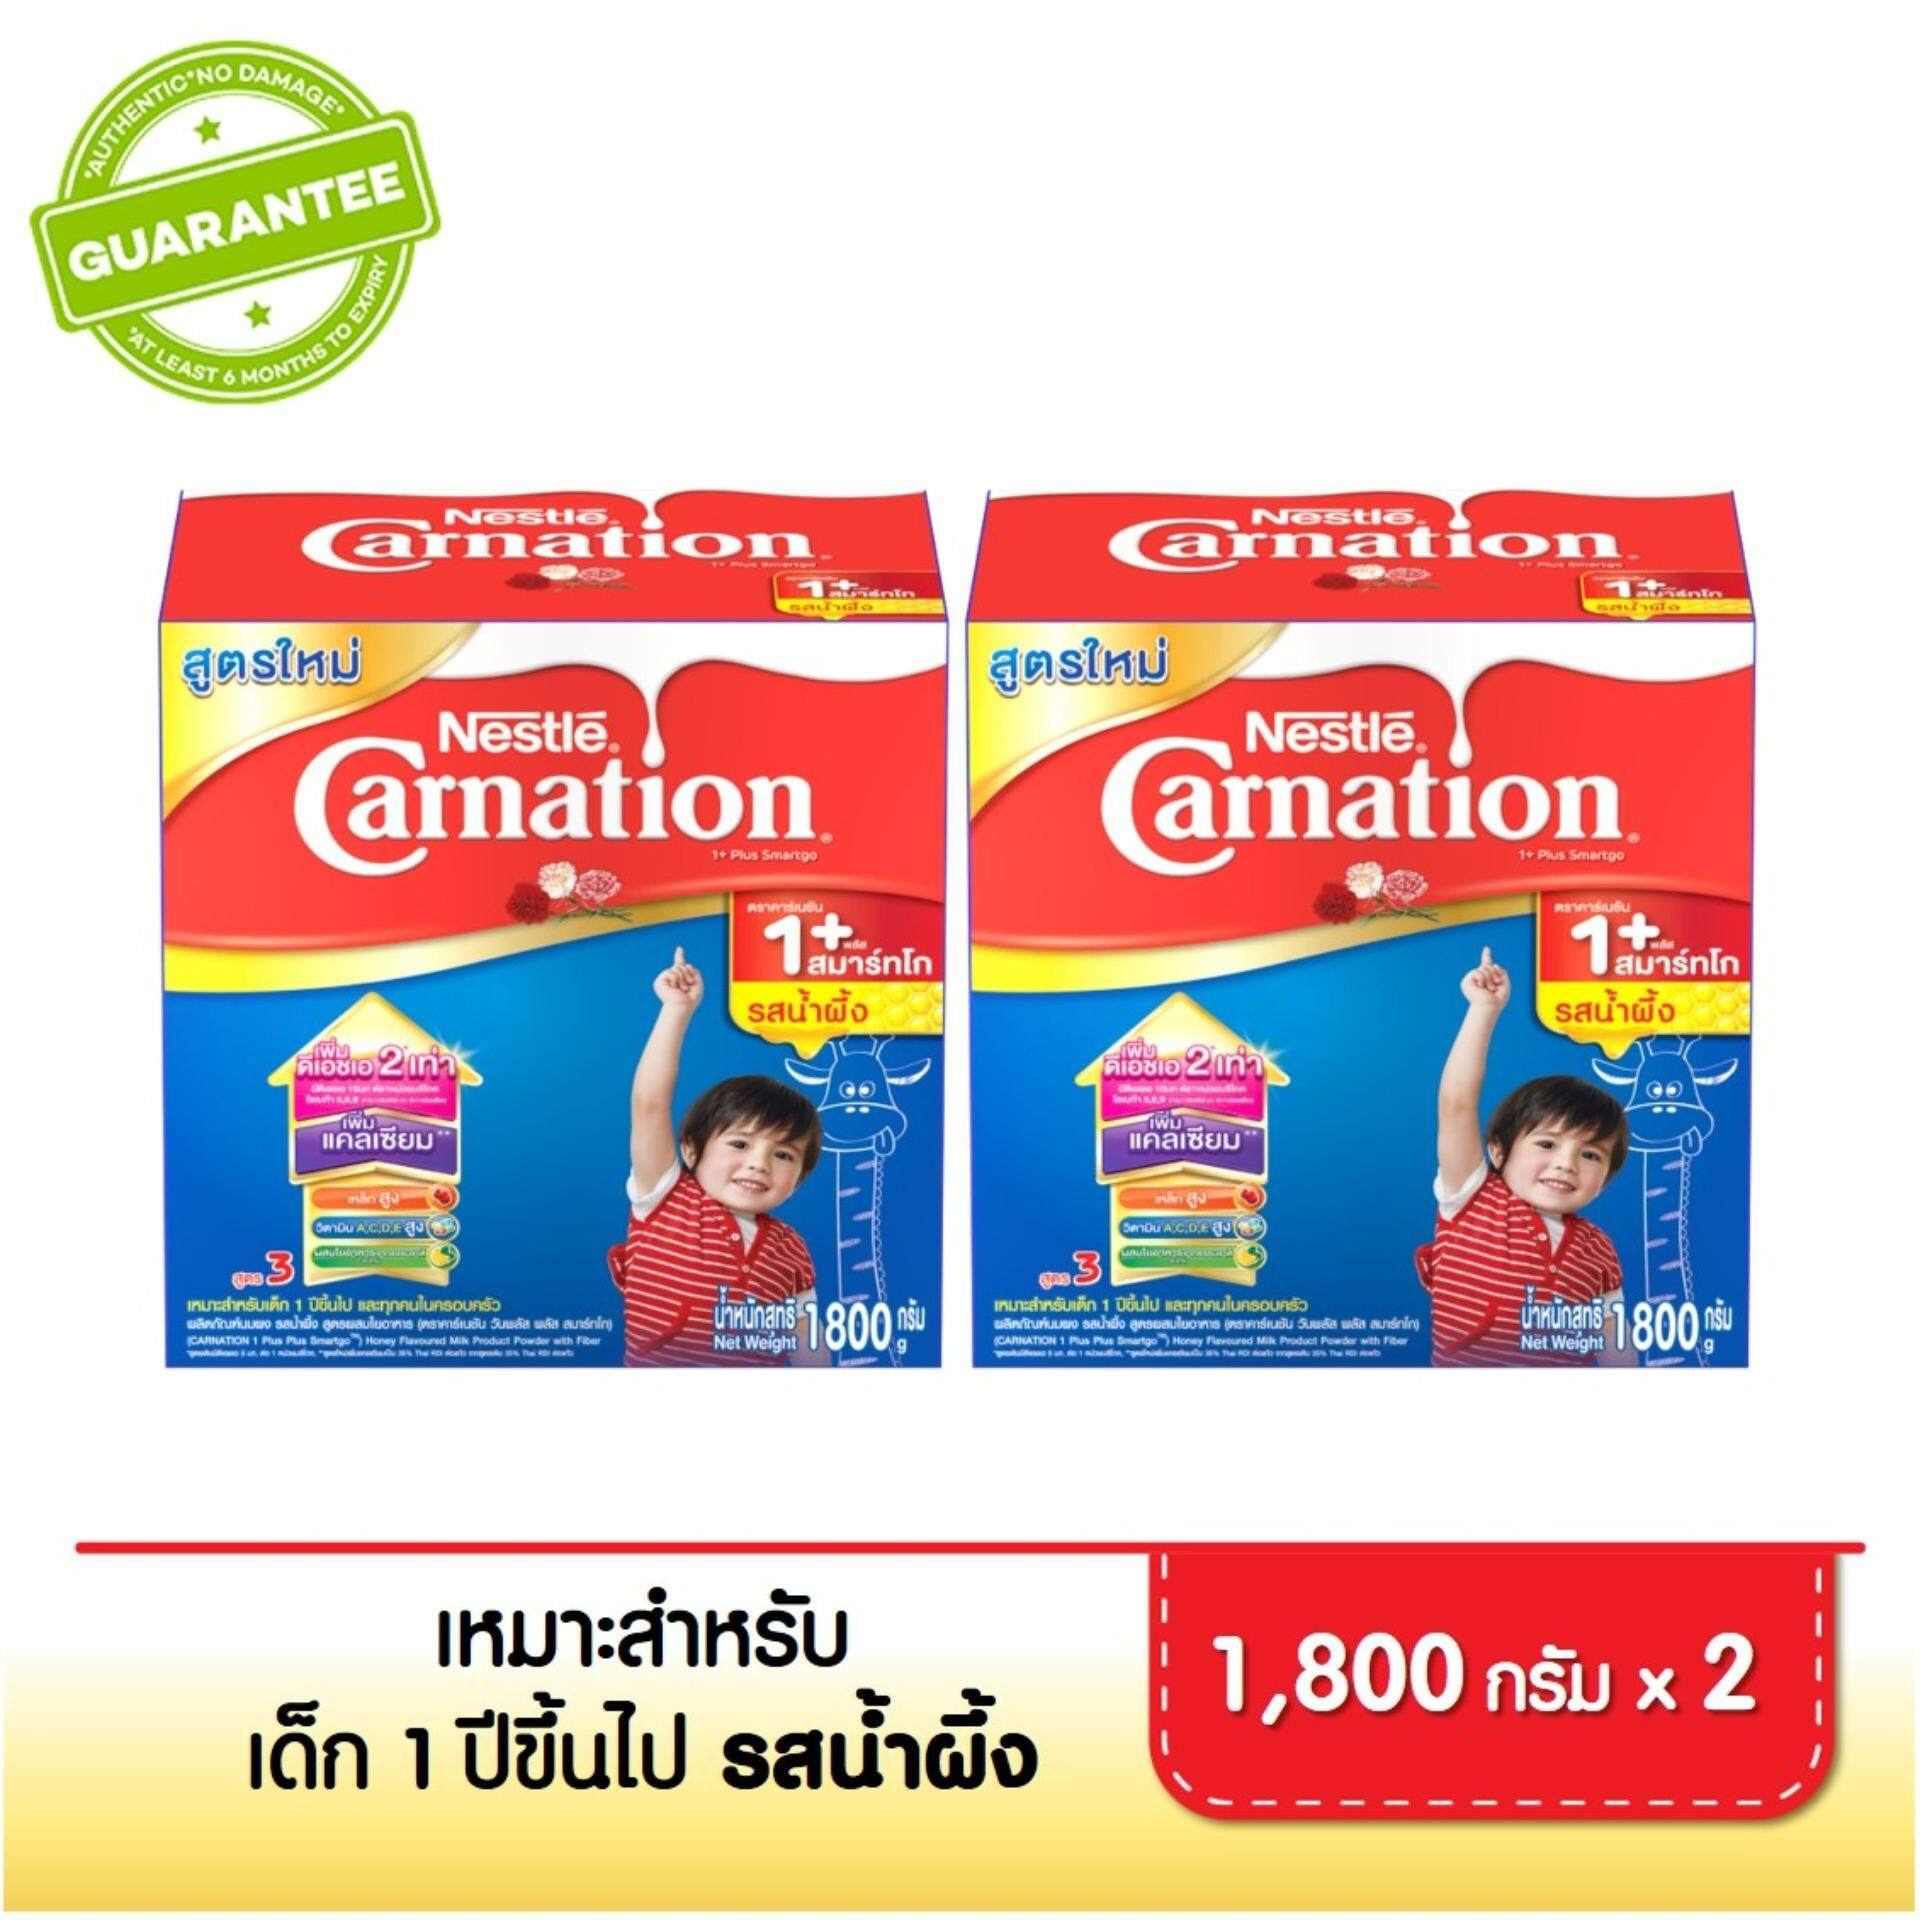 Nestle Carnation นมผง เนสท์เล่ คาร์เนชัน 1 พลัส รสน้ำผึ้ง 1800 กรัม (2 กล่อง) By Lazada Retail Carnation.